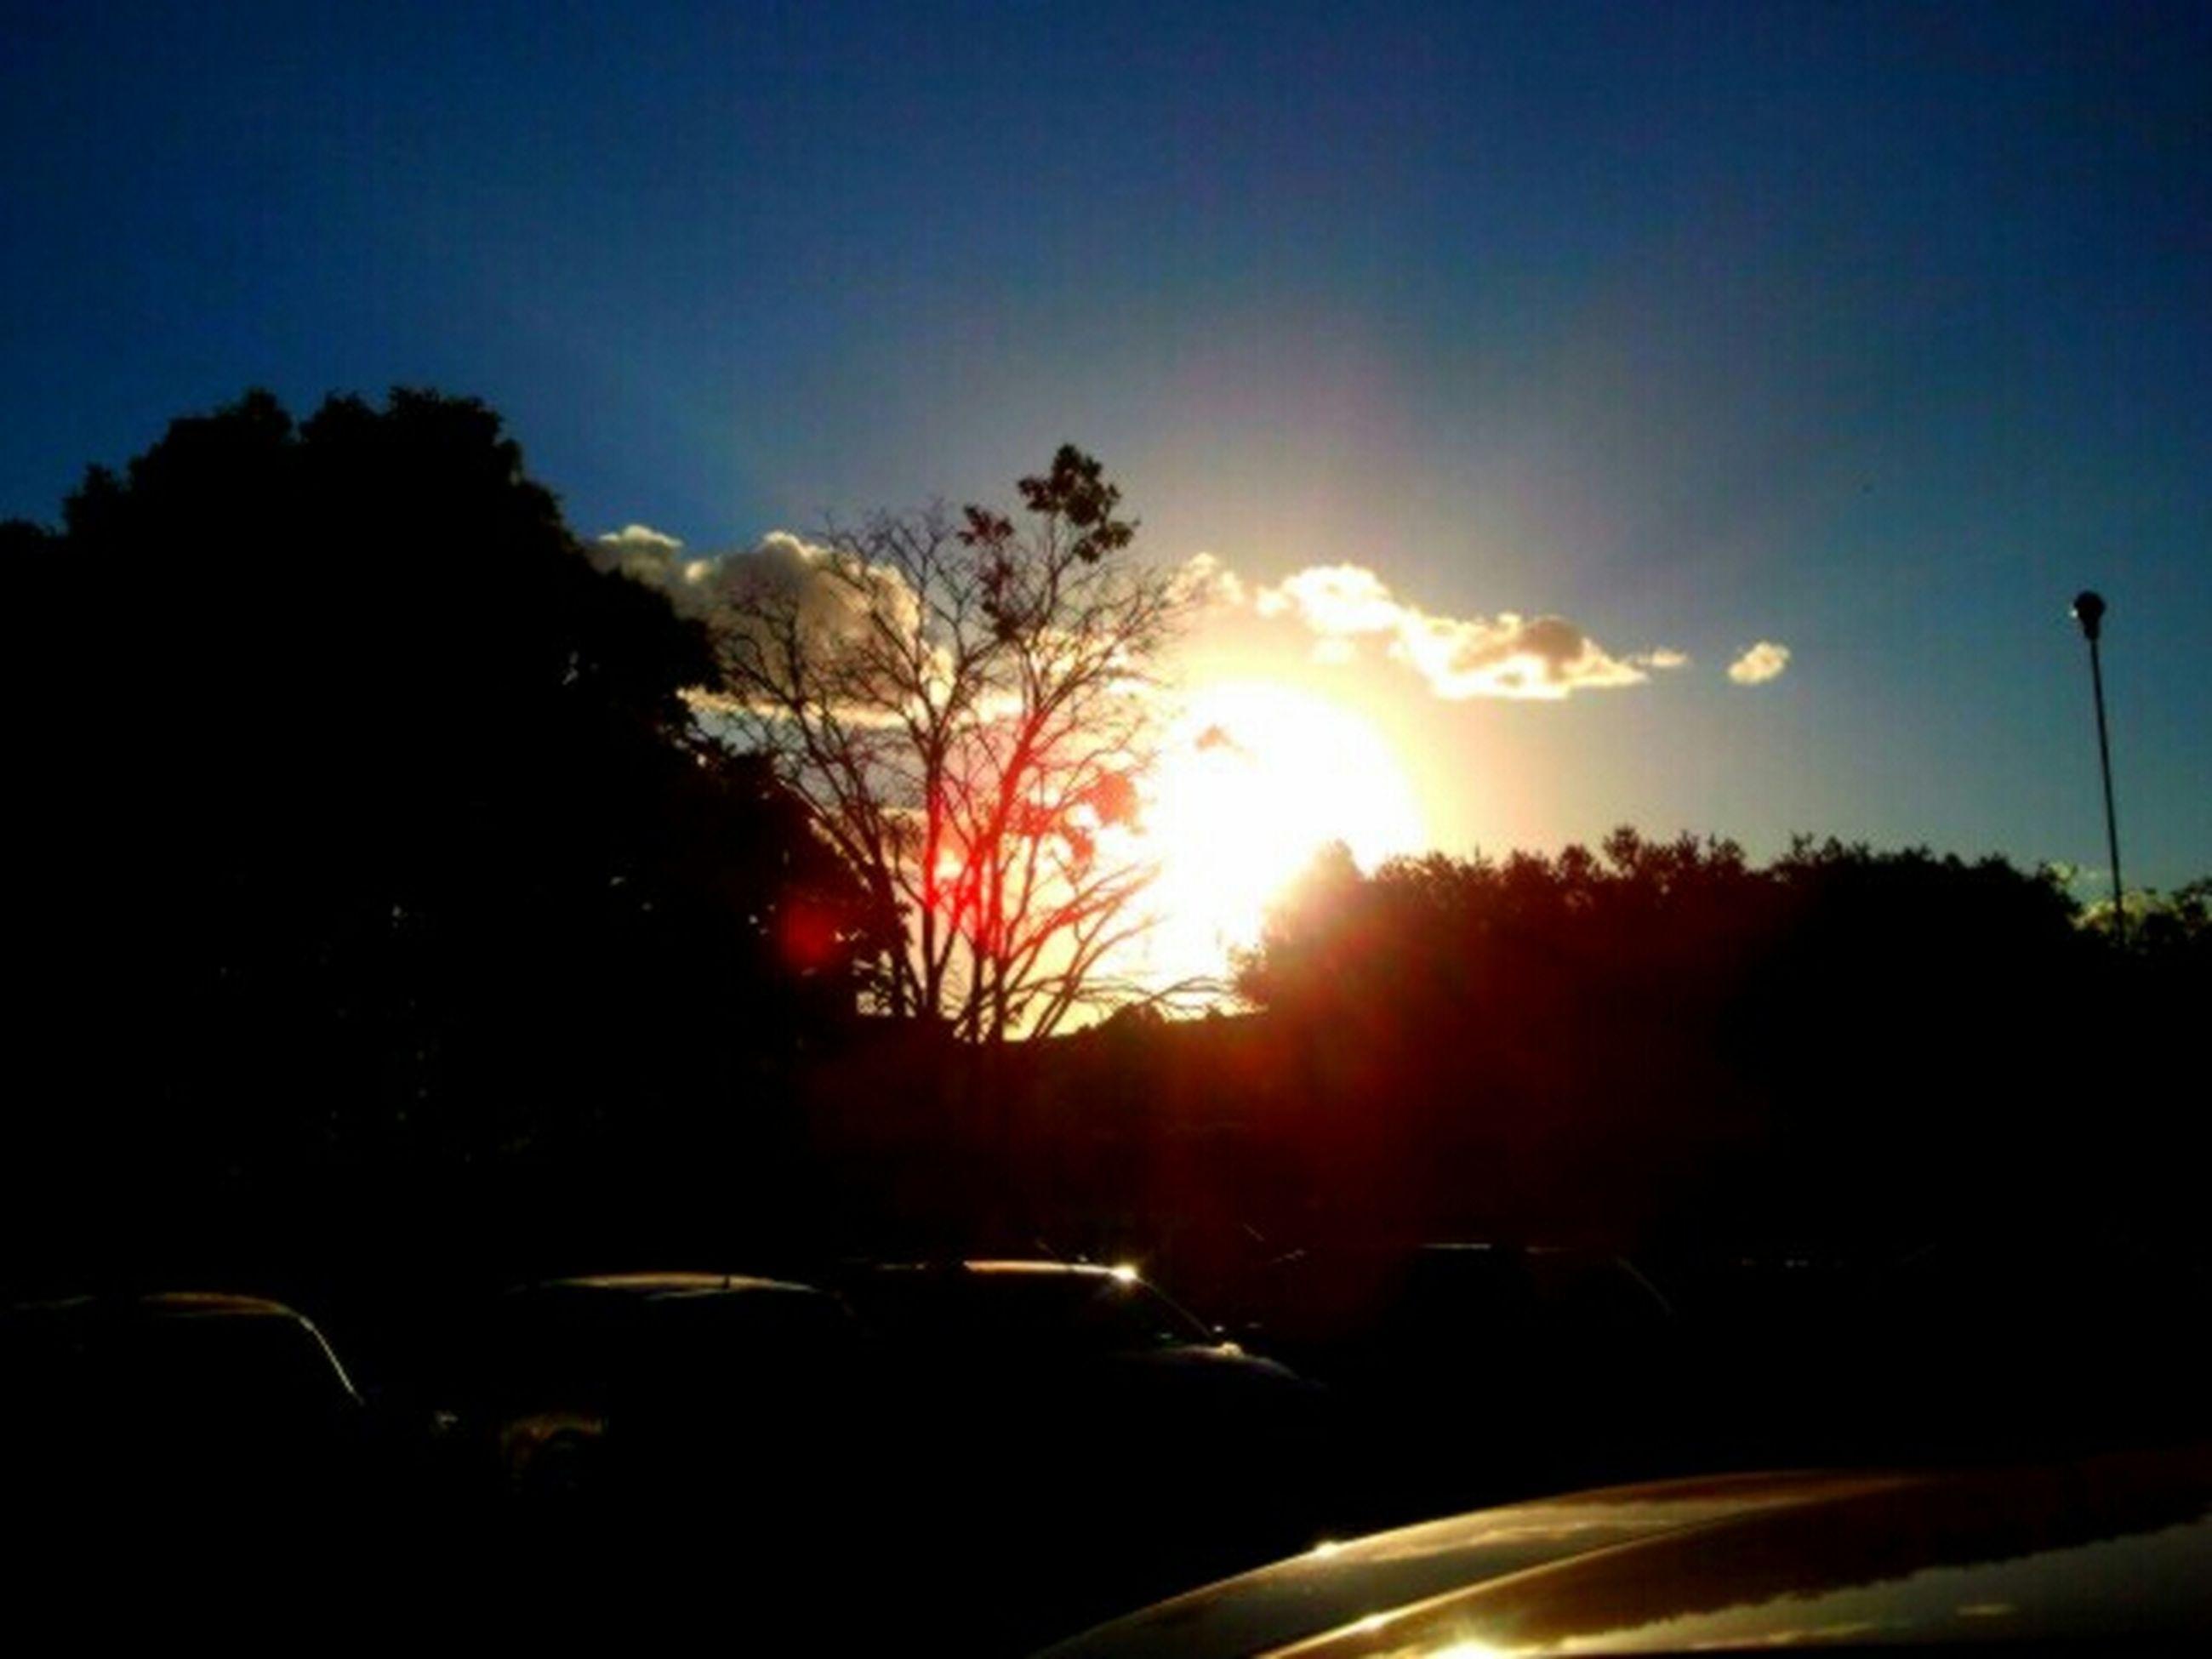 transportation, car, tree, land vehicle, sunset, road, silhouette, mode of transport, sky, sun, street, sunlight, lens flare, nature, sunbeam, street light, outdoors, no people, clear sky, traffic